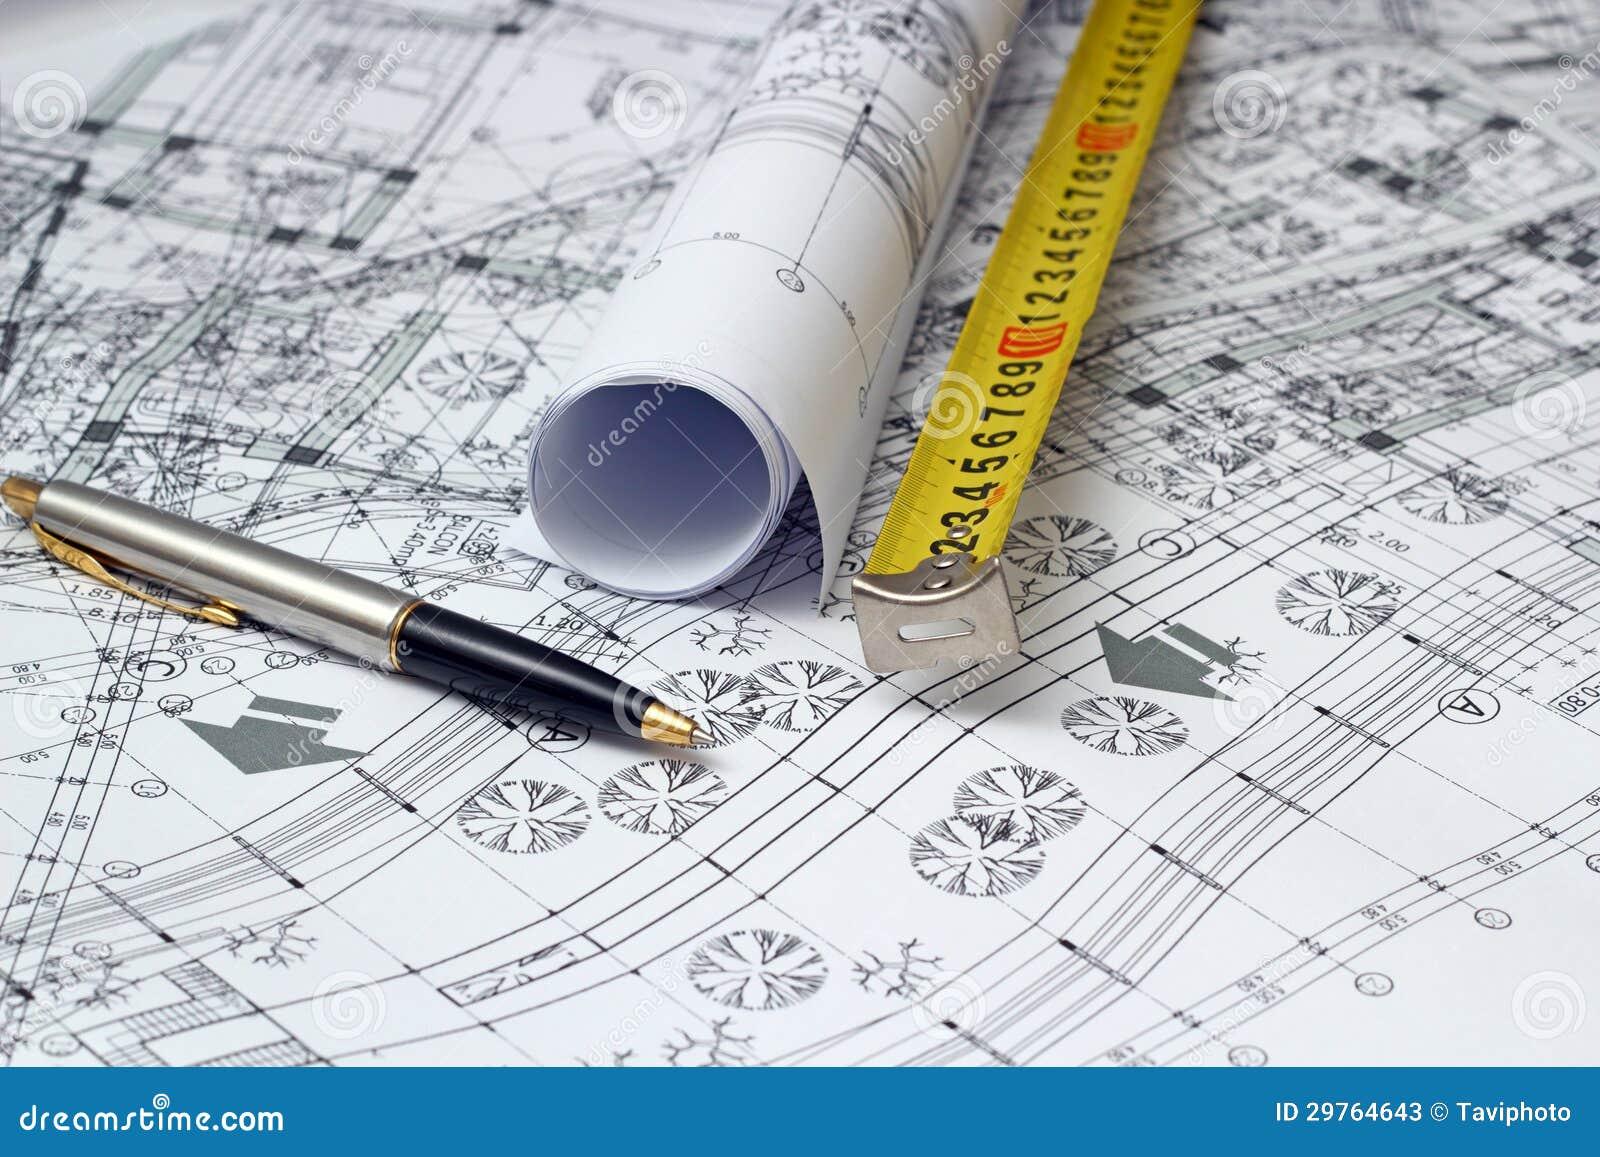 Drawing Kit Project Stock Photo CartoonDealercom 31757214